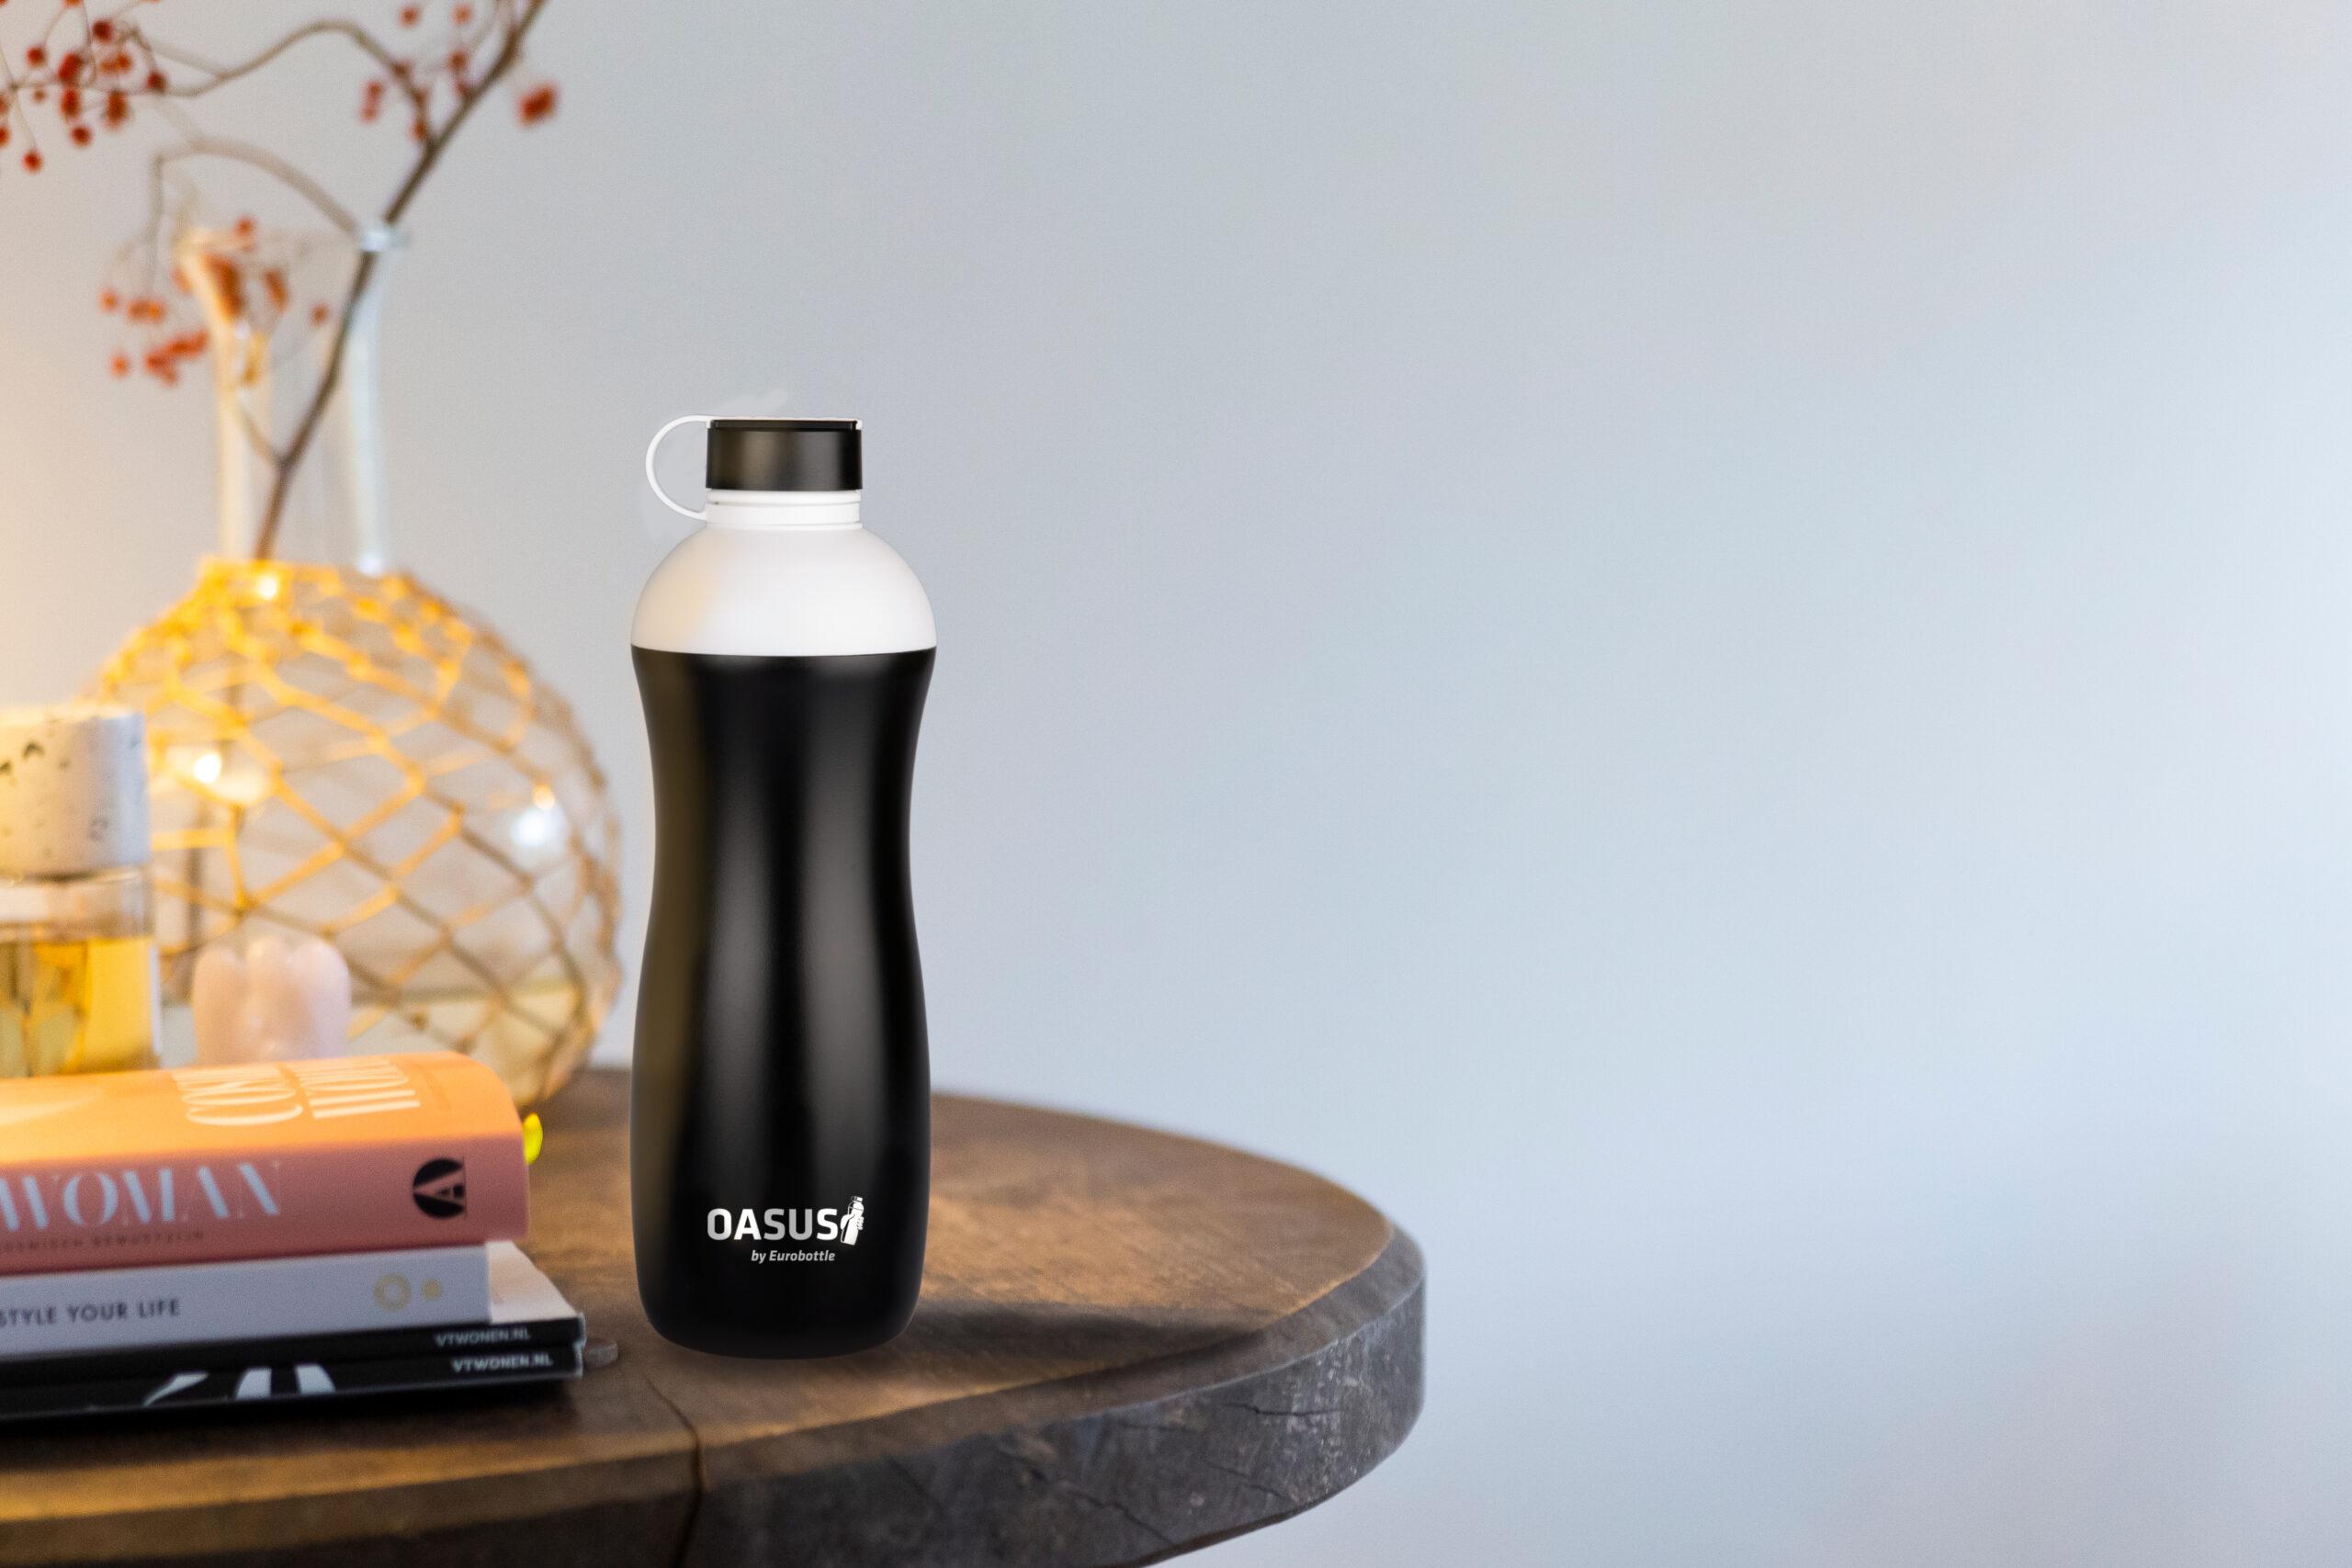 Oasus by Eurobottle | Personalisierbare Trinkflasche